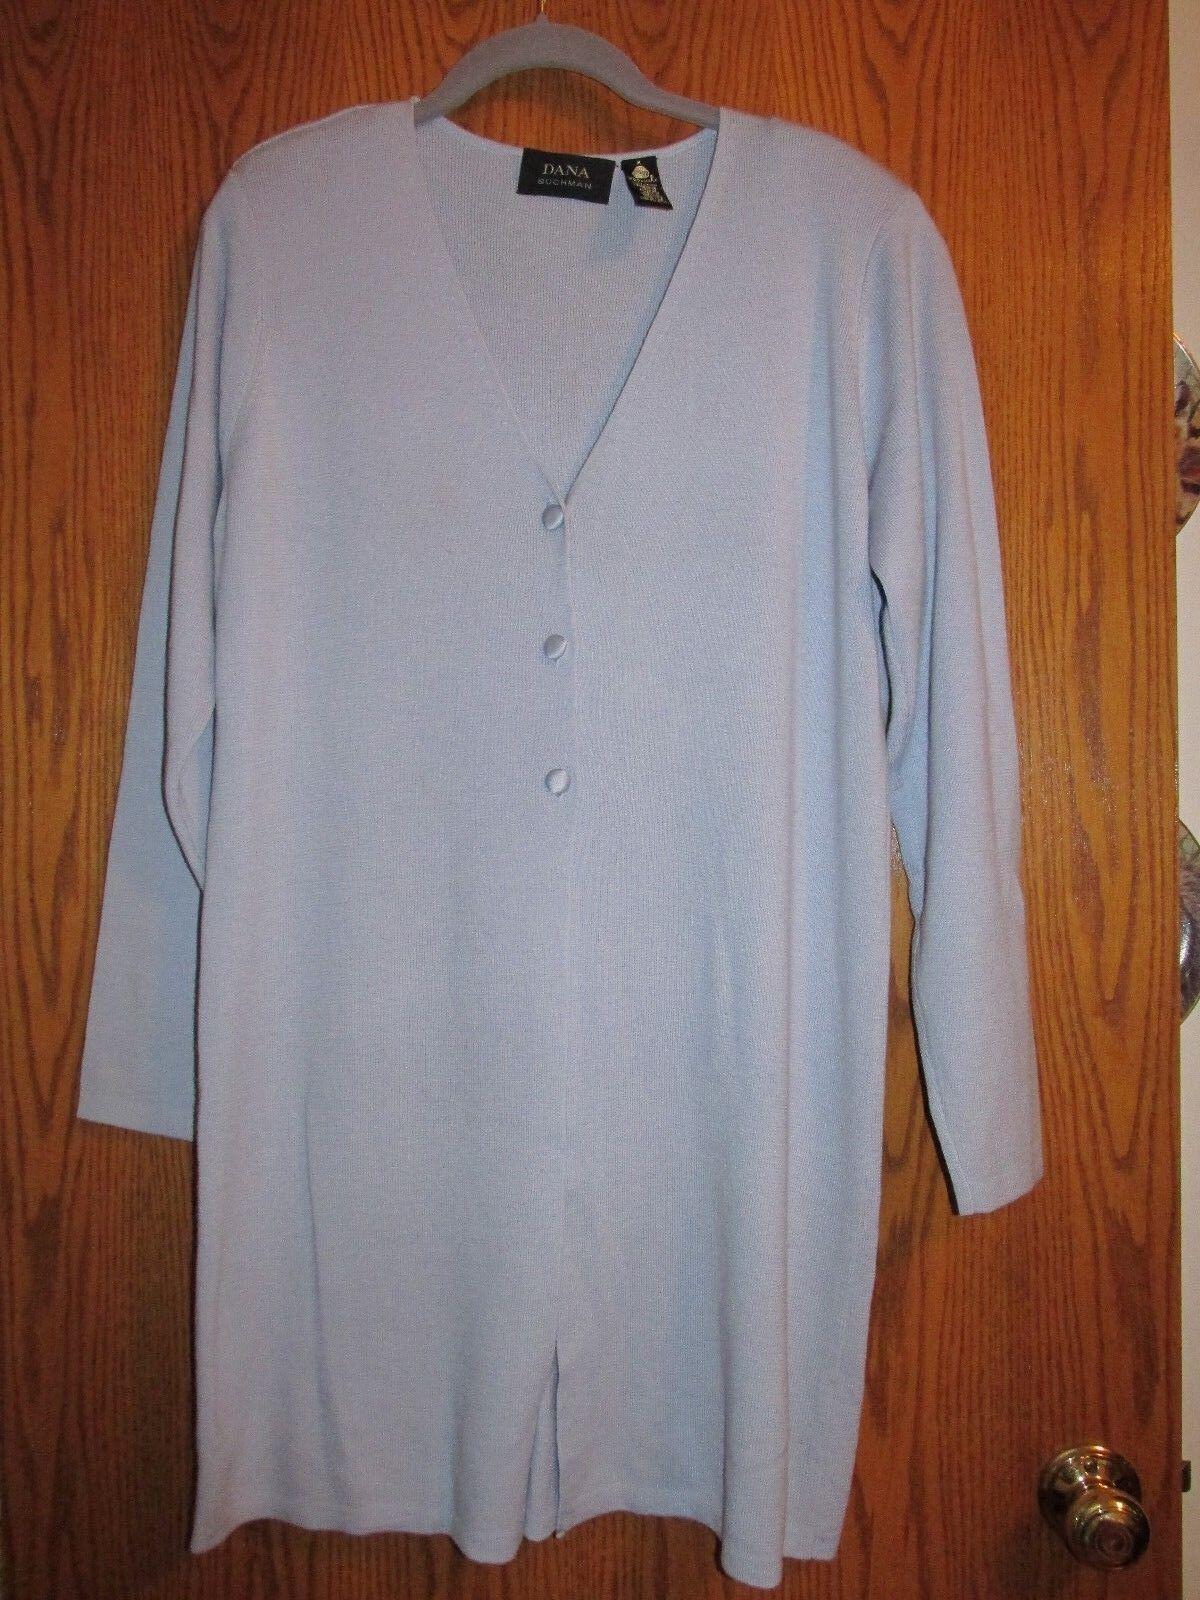 Dana Buchman 100%merino Wolle,3 Taste-front cardigan duster - Medium - Baby Blau